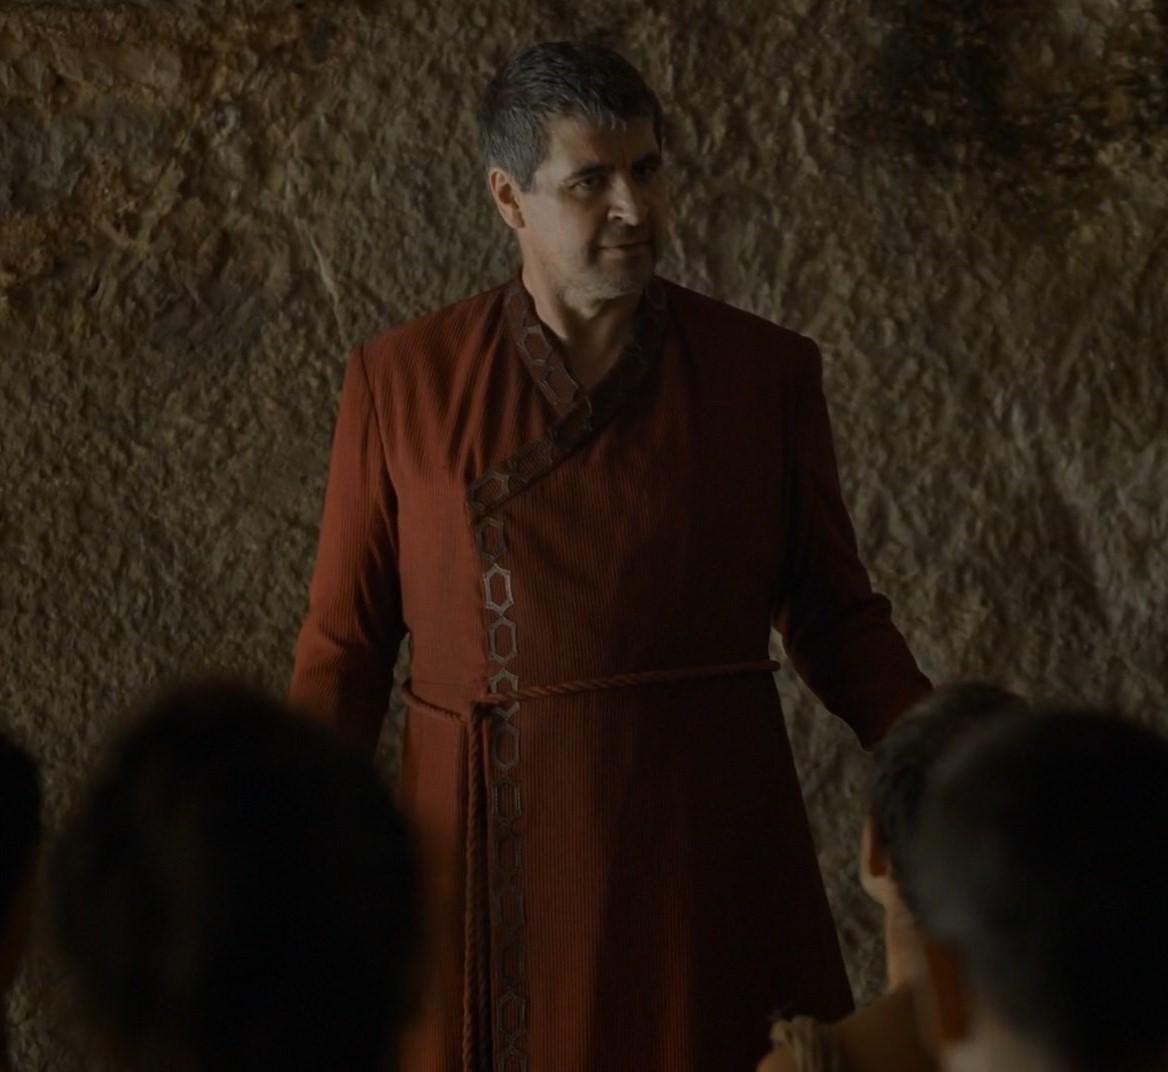 Gerald Lepkowski in Game of Thrones (2011)